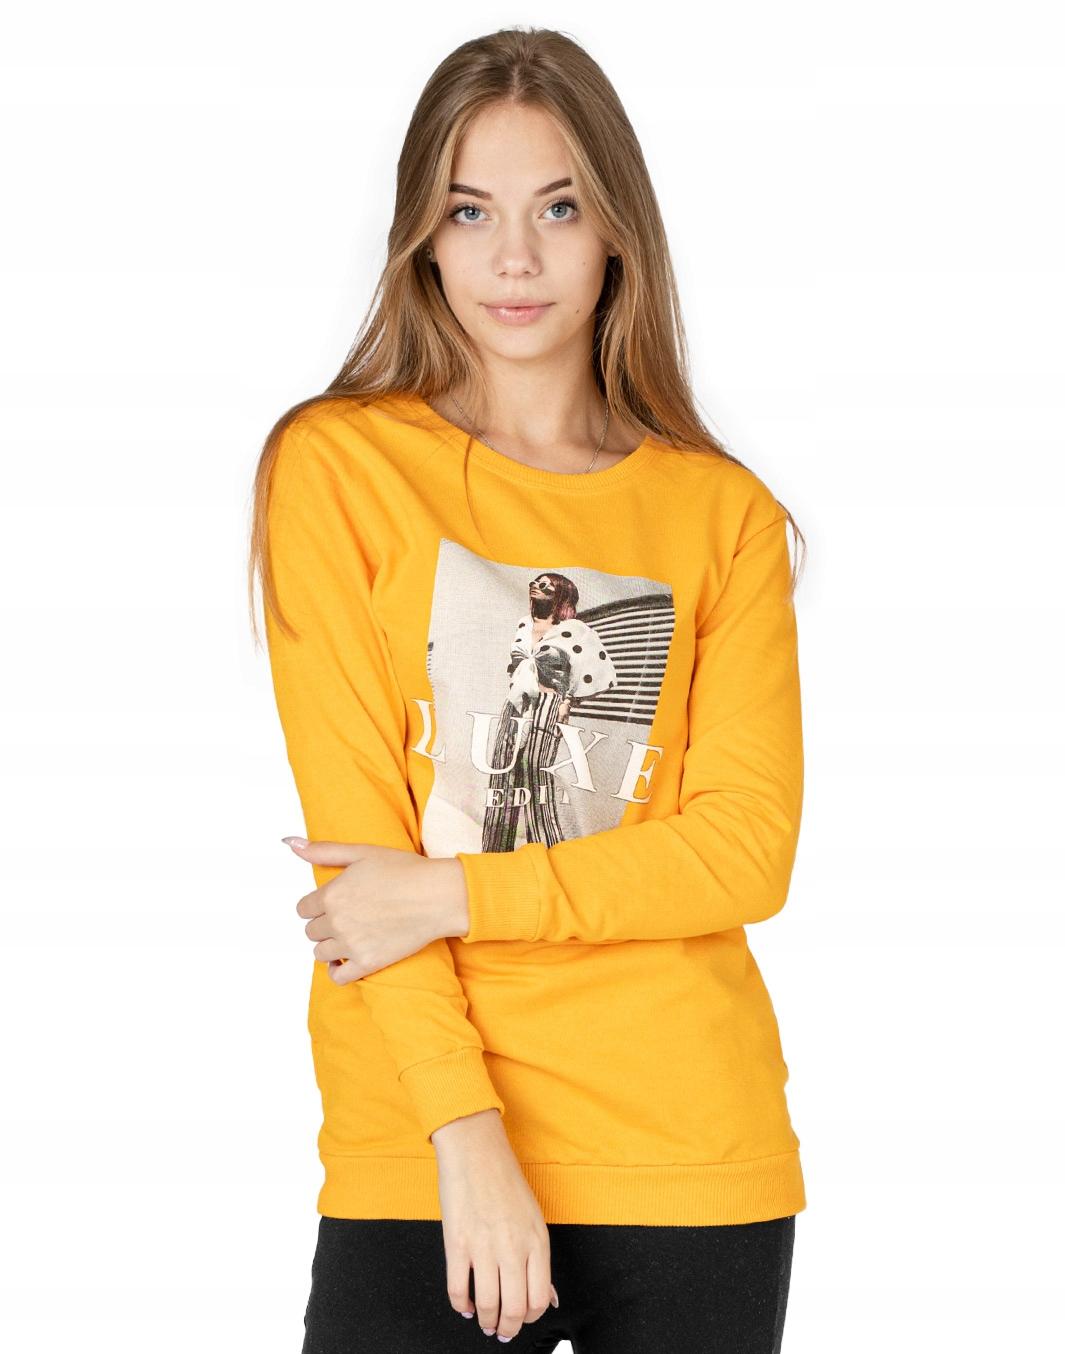 Długa Bluza Tunika Damska Bawełniana 242-09 r XL